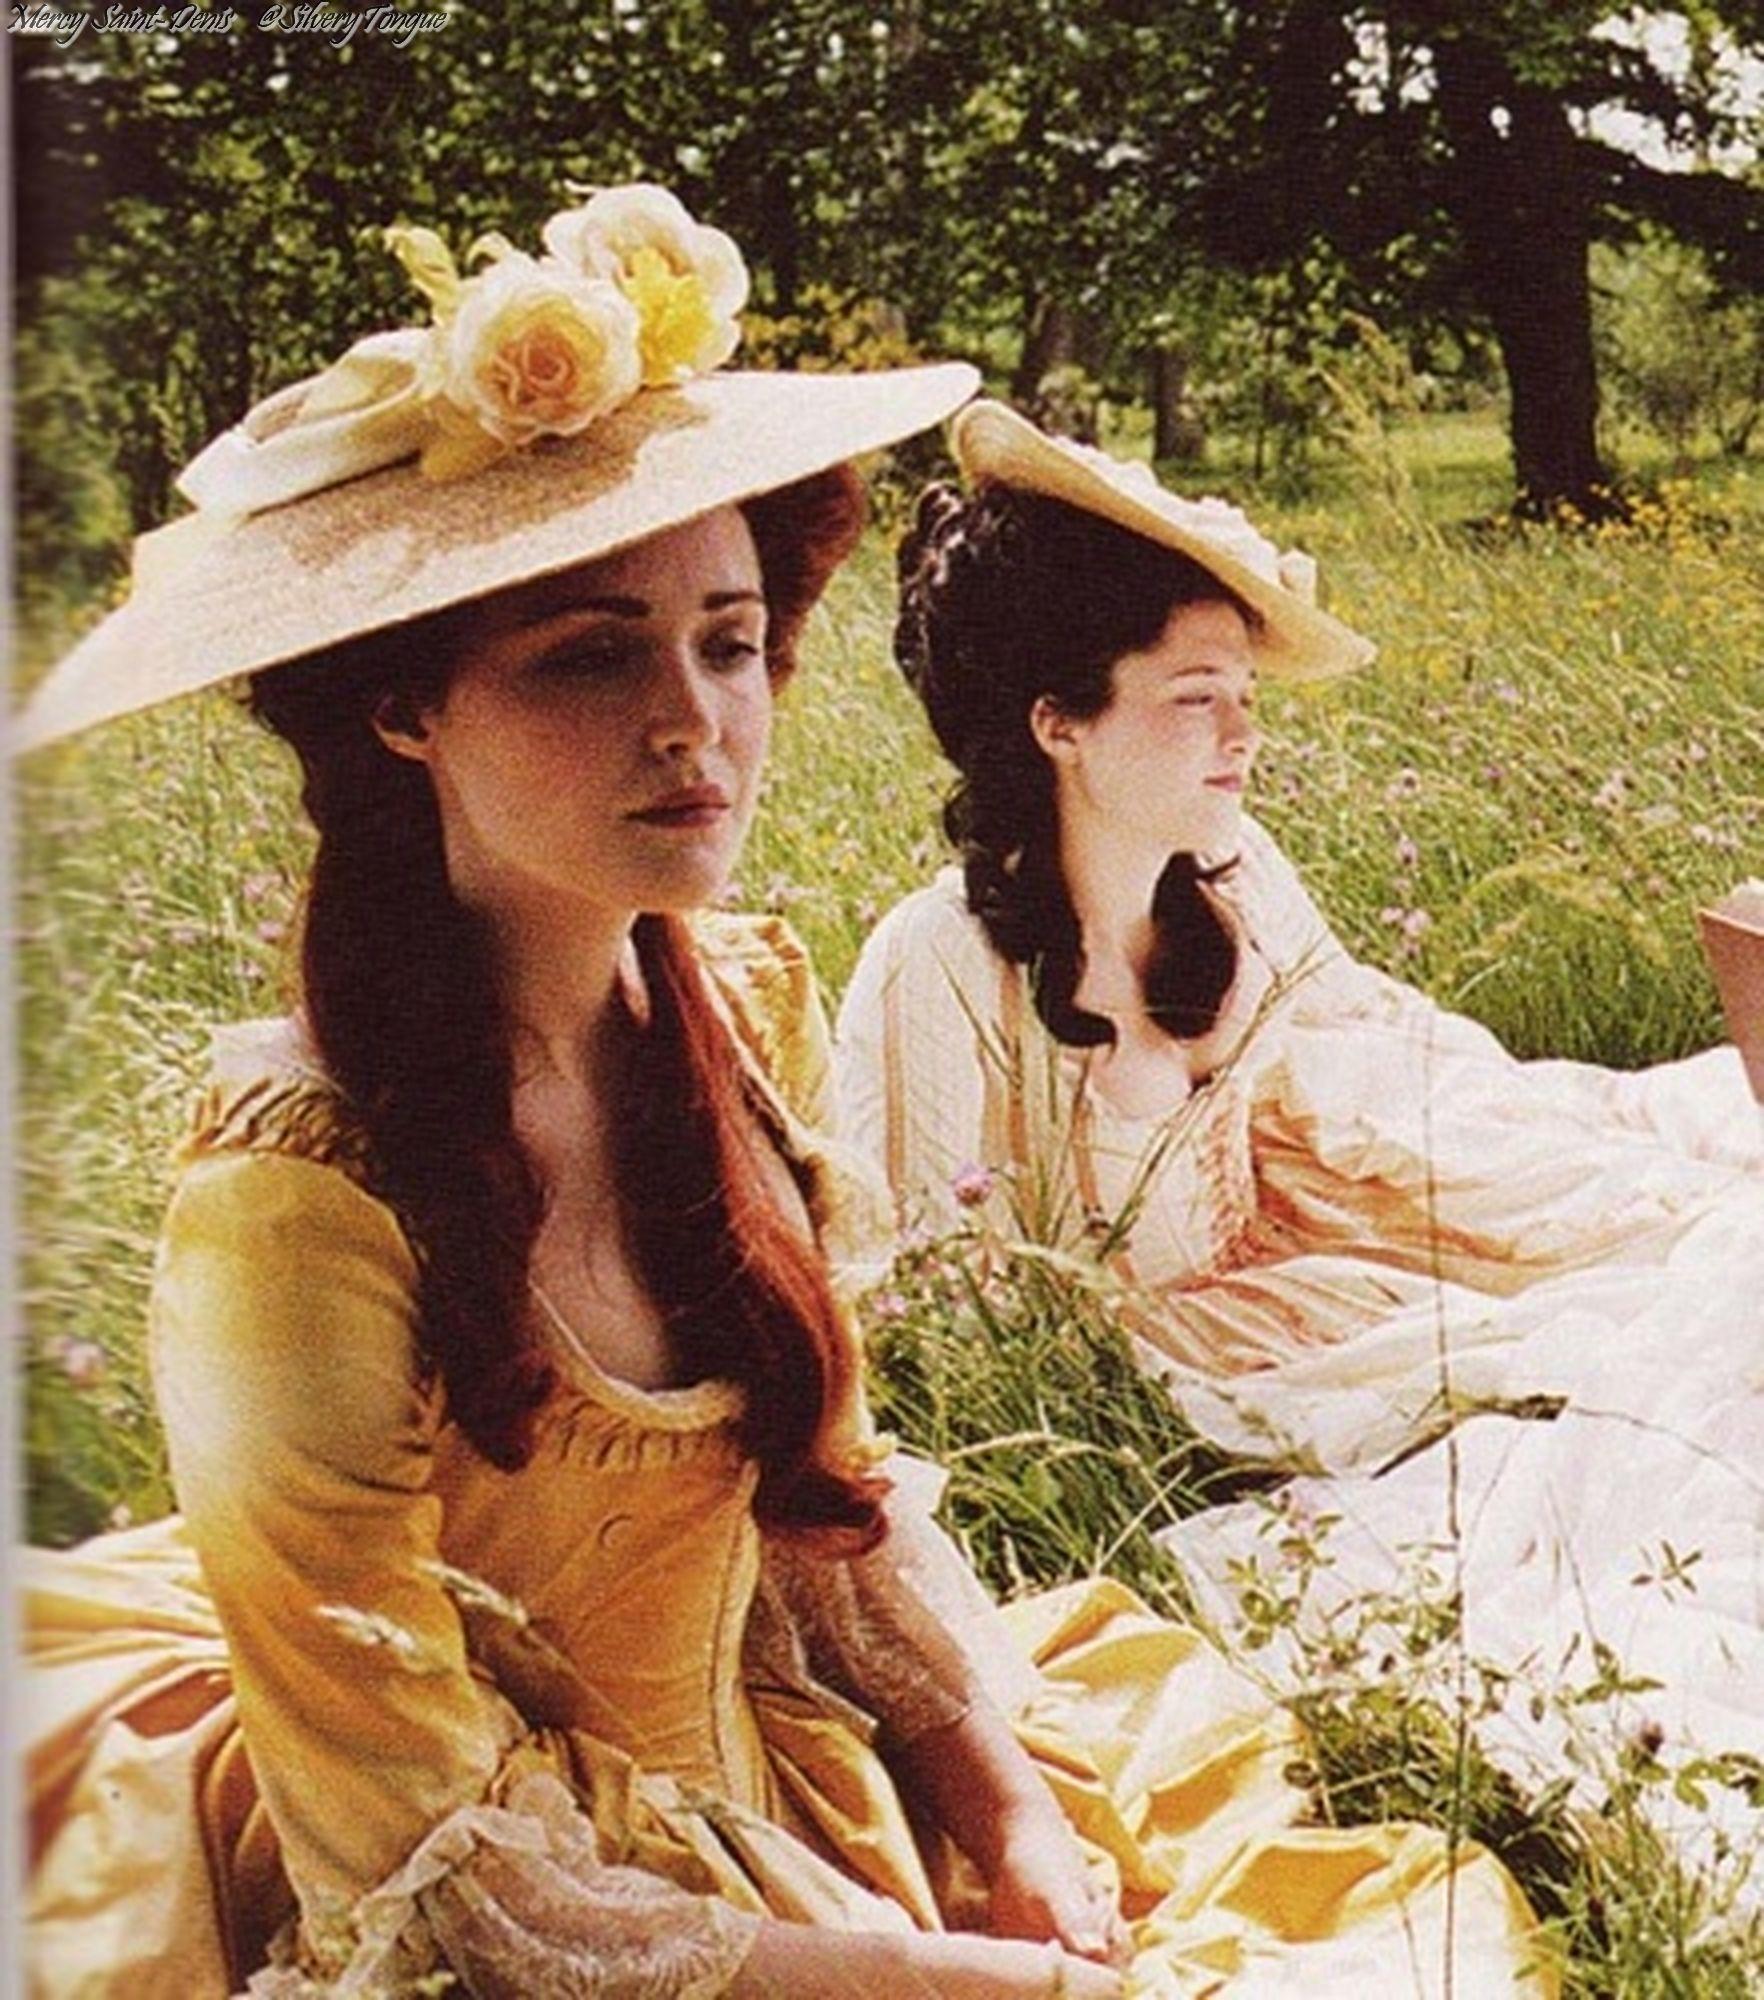 Rose Byrne as the Duchesse de Polignac in Marie Antoinette (2006). | Marie  antoinette movie, Marie antoinette 2006, Marie antoinette